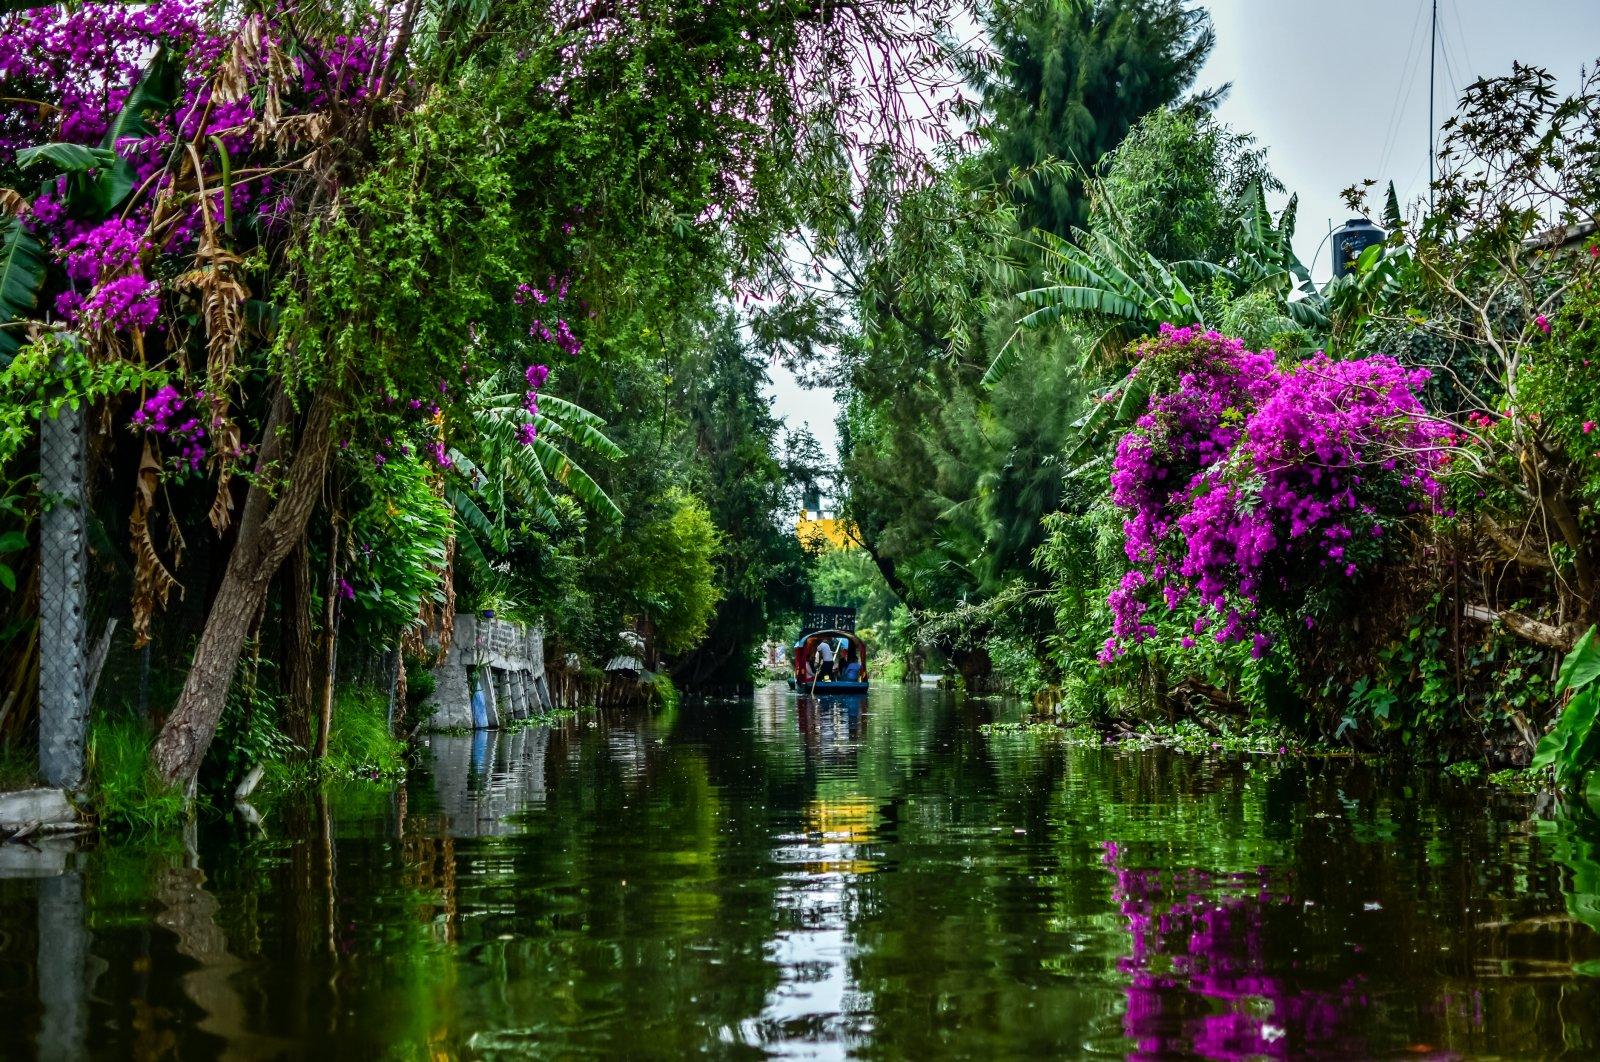 Floating Gardens of Xochimilco, Mexico. (Shutterstock Photo)